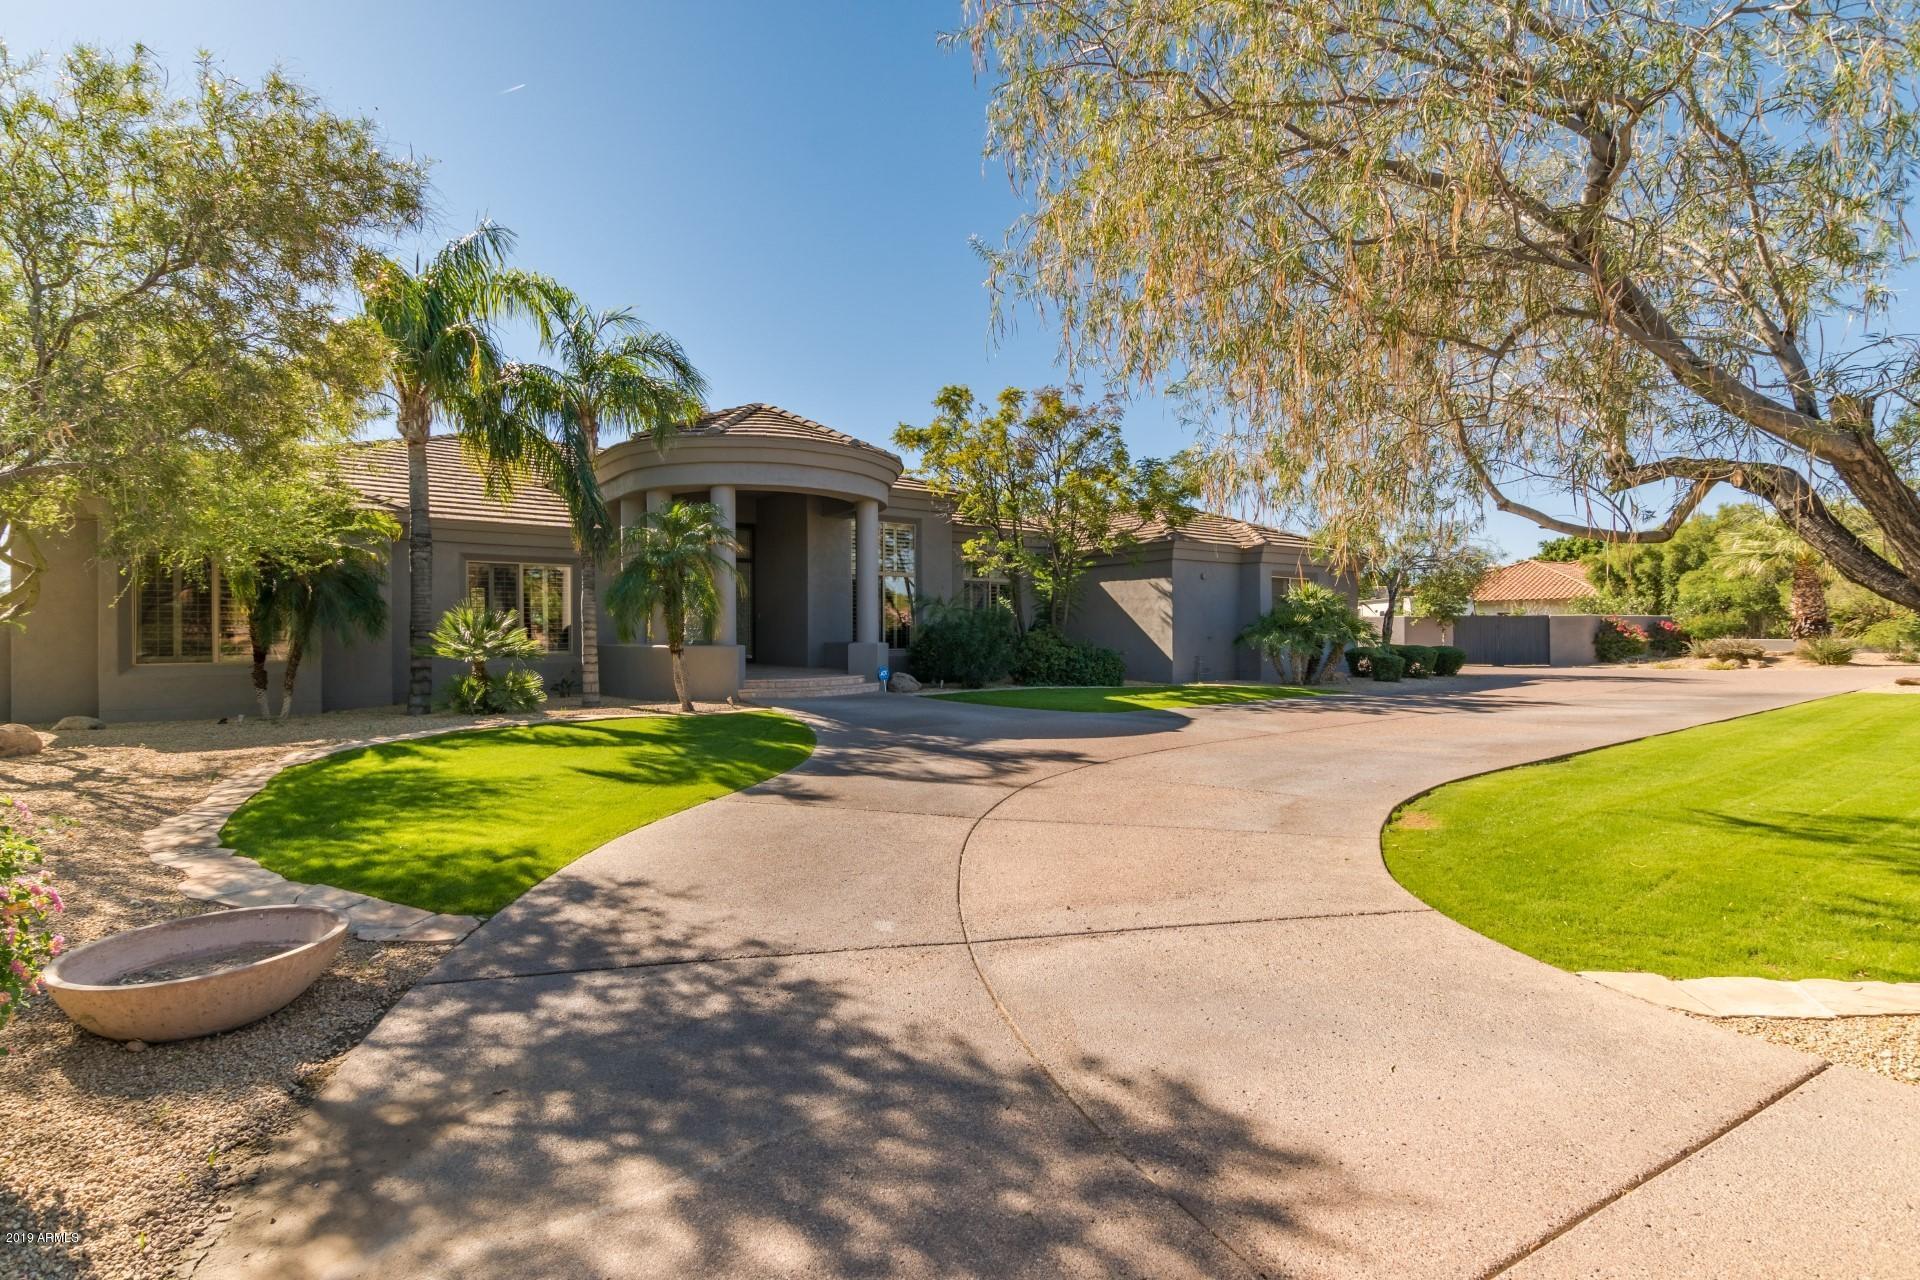 12501 E DOUBLETREE RANCH Road, Scottsdale AZ 85259